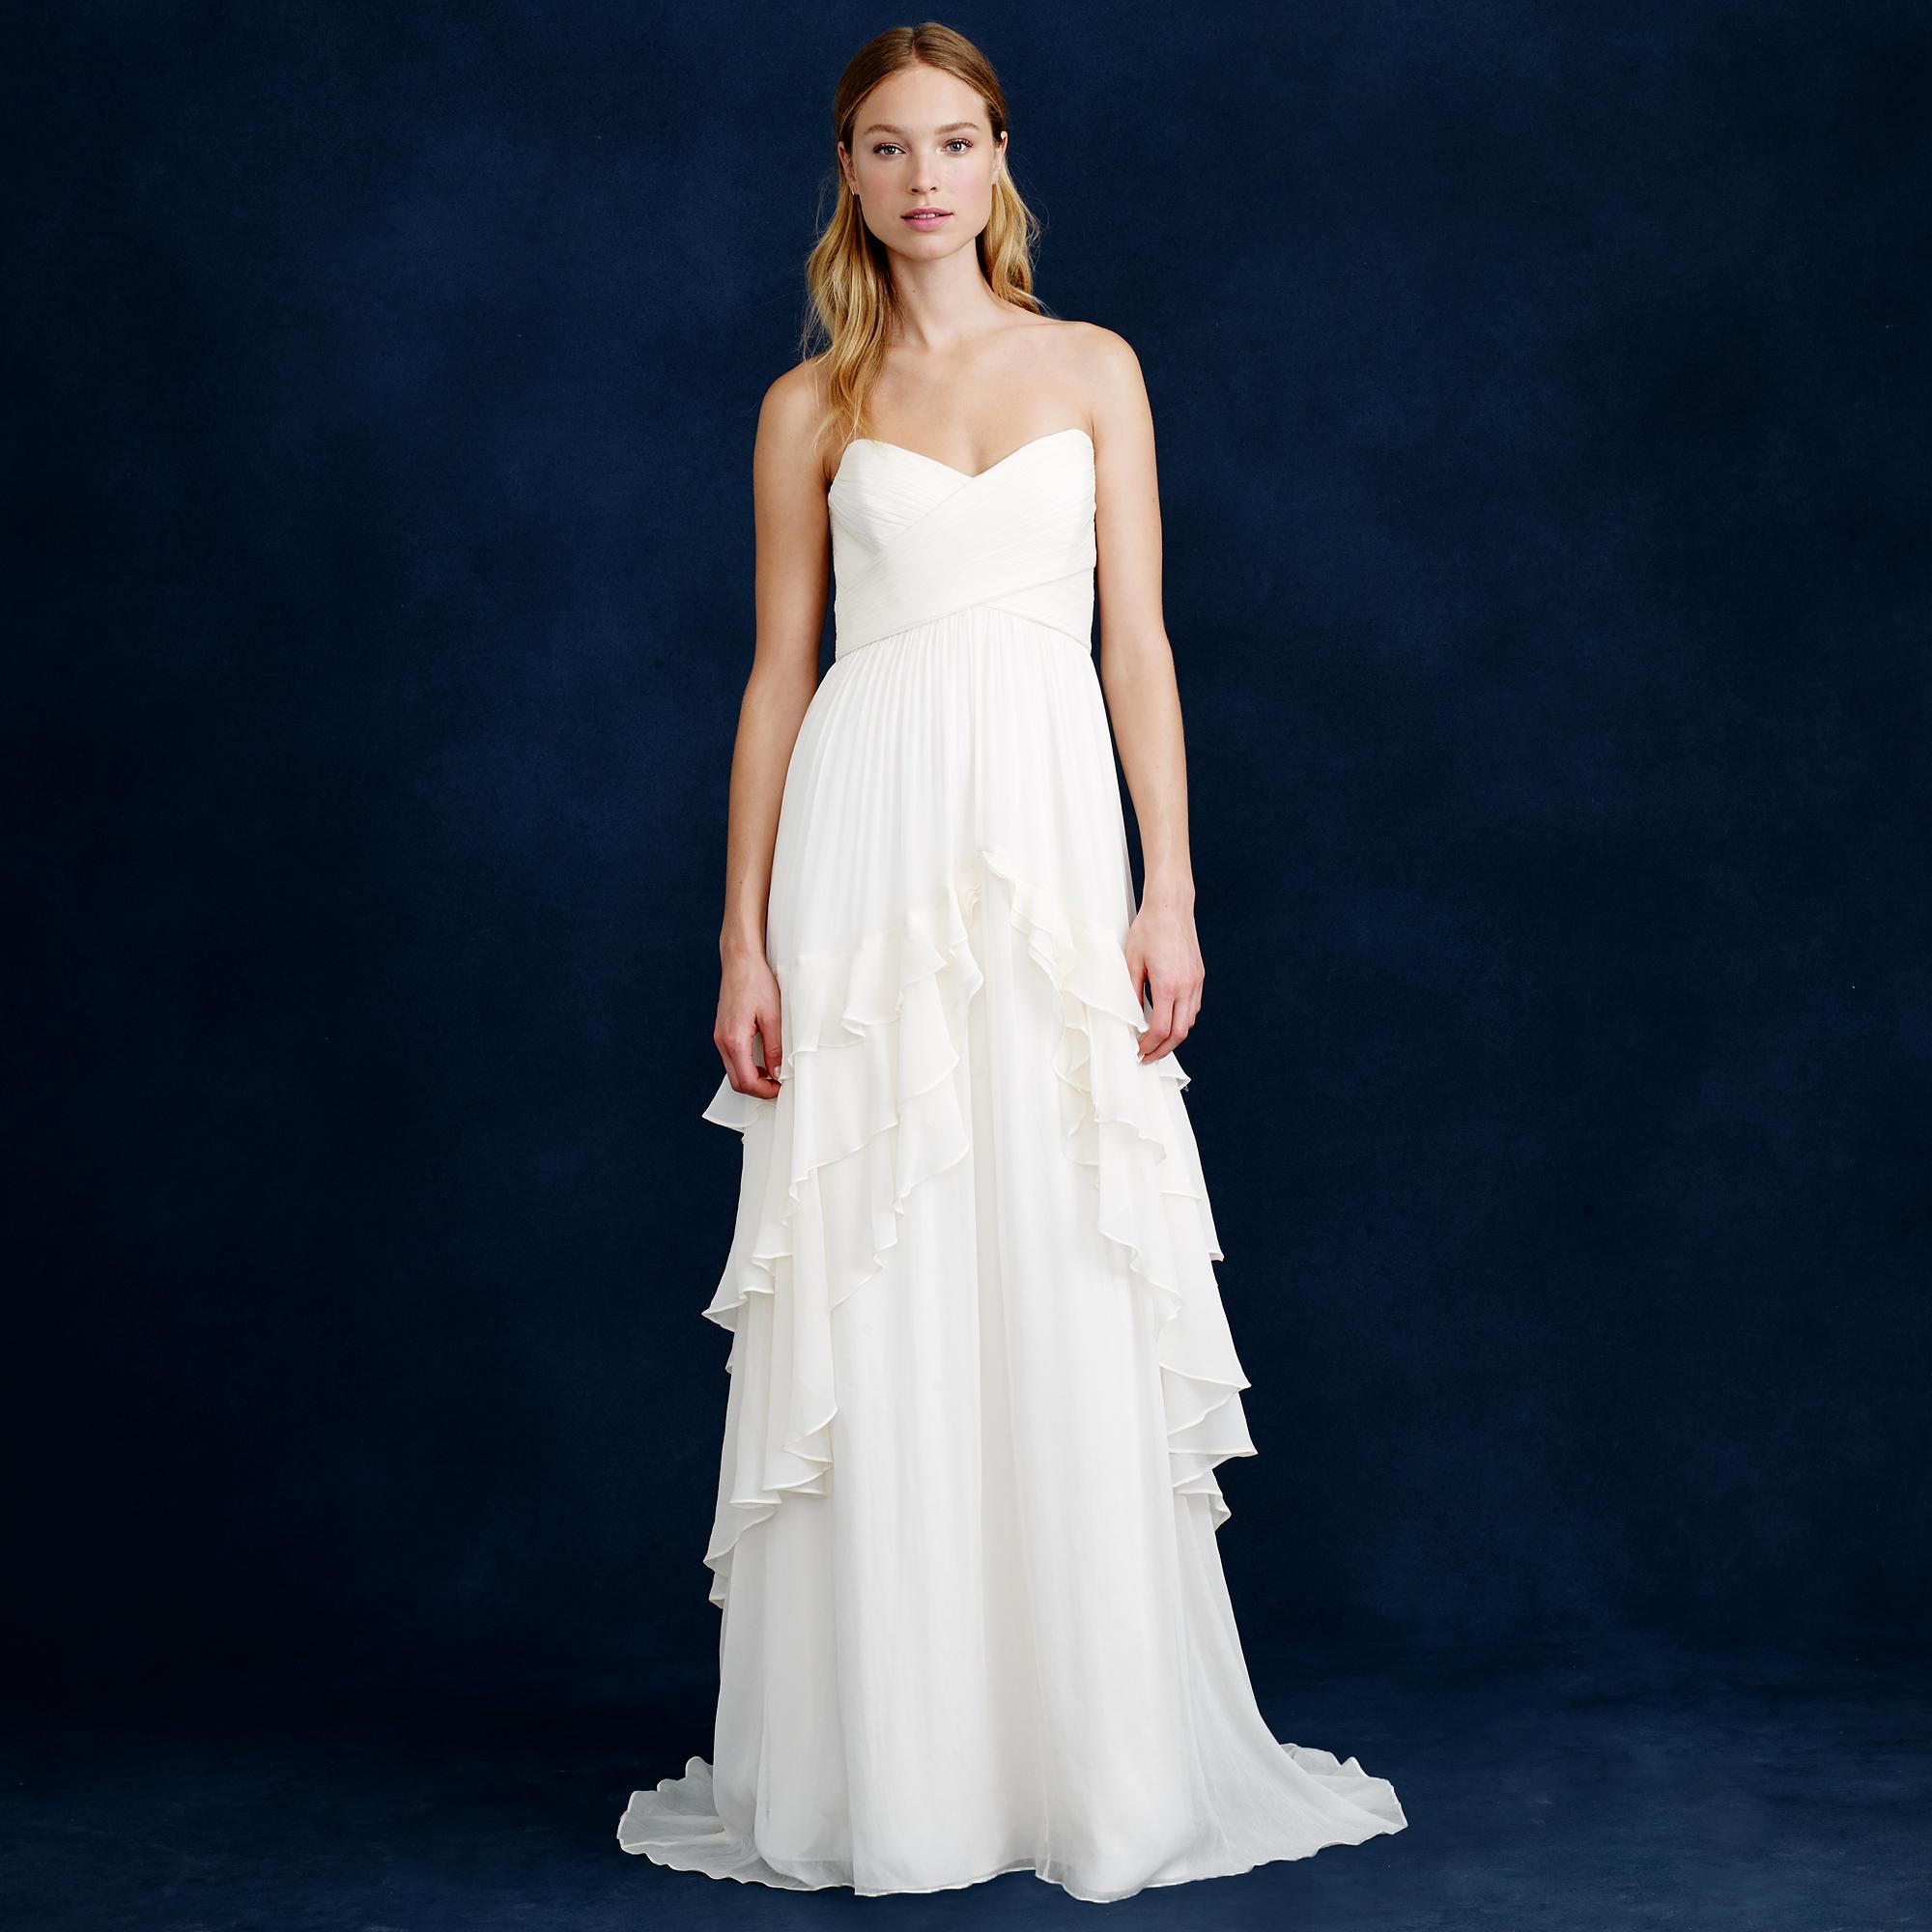 wedding dresses under wedding dress under Ruffled Wedding Dress Under